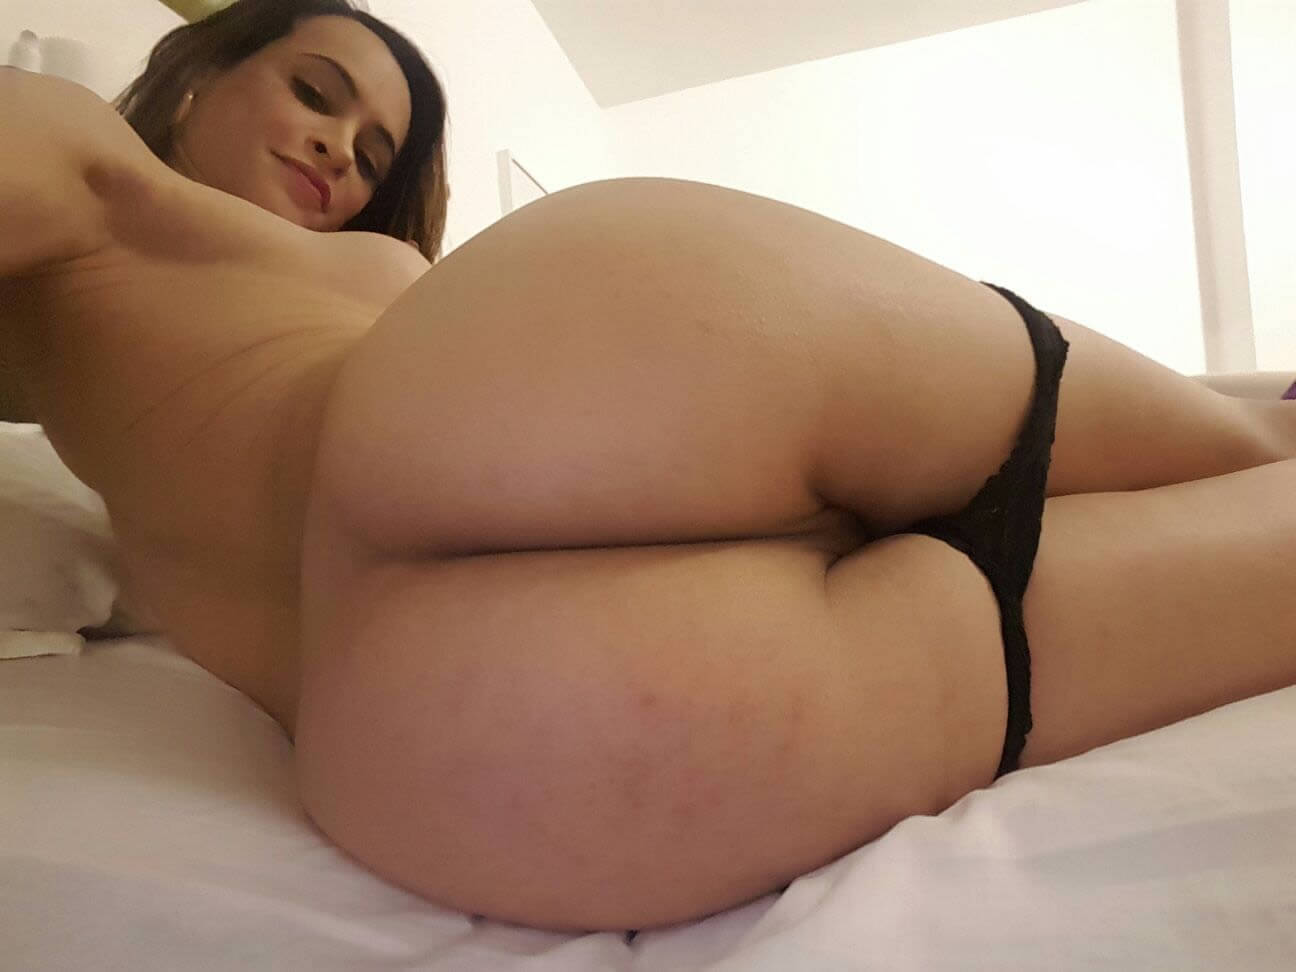 Carla Brasil Shemale Fotos Xxx Y Vídeos Porno 100 Gratis